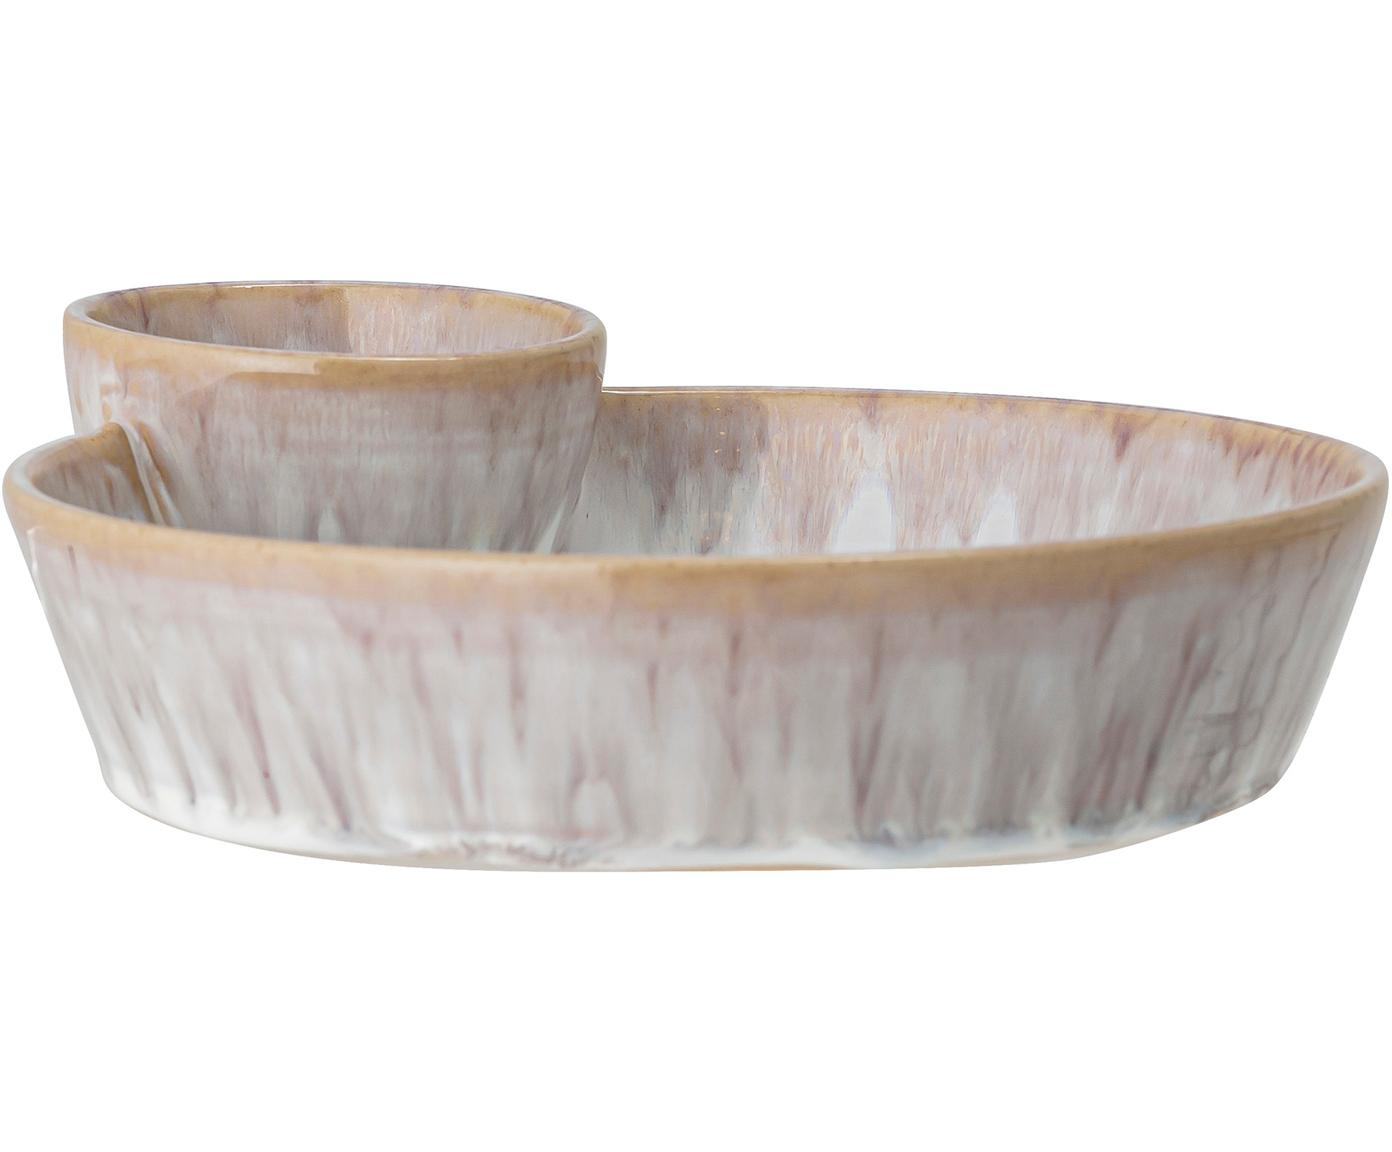 Ciotola fatta a mano Caya, Terracotta, Beige, Larg. 24 x Alt. 4 cm